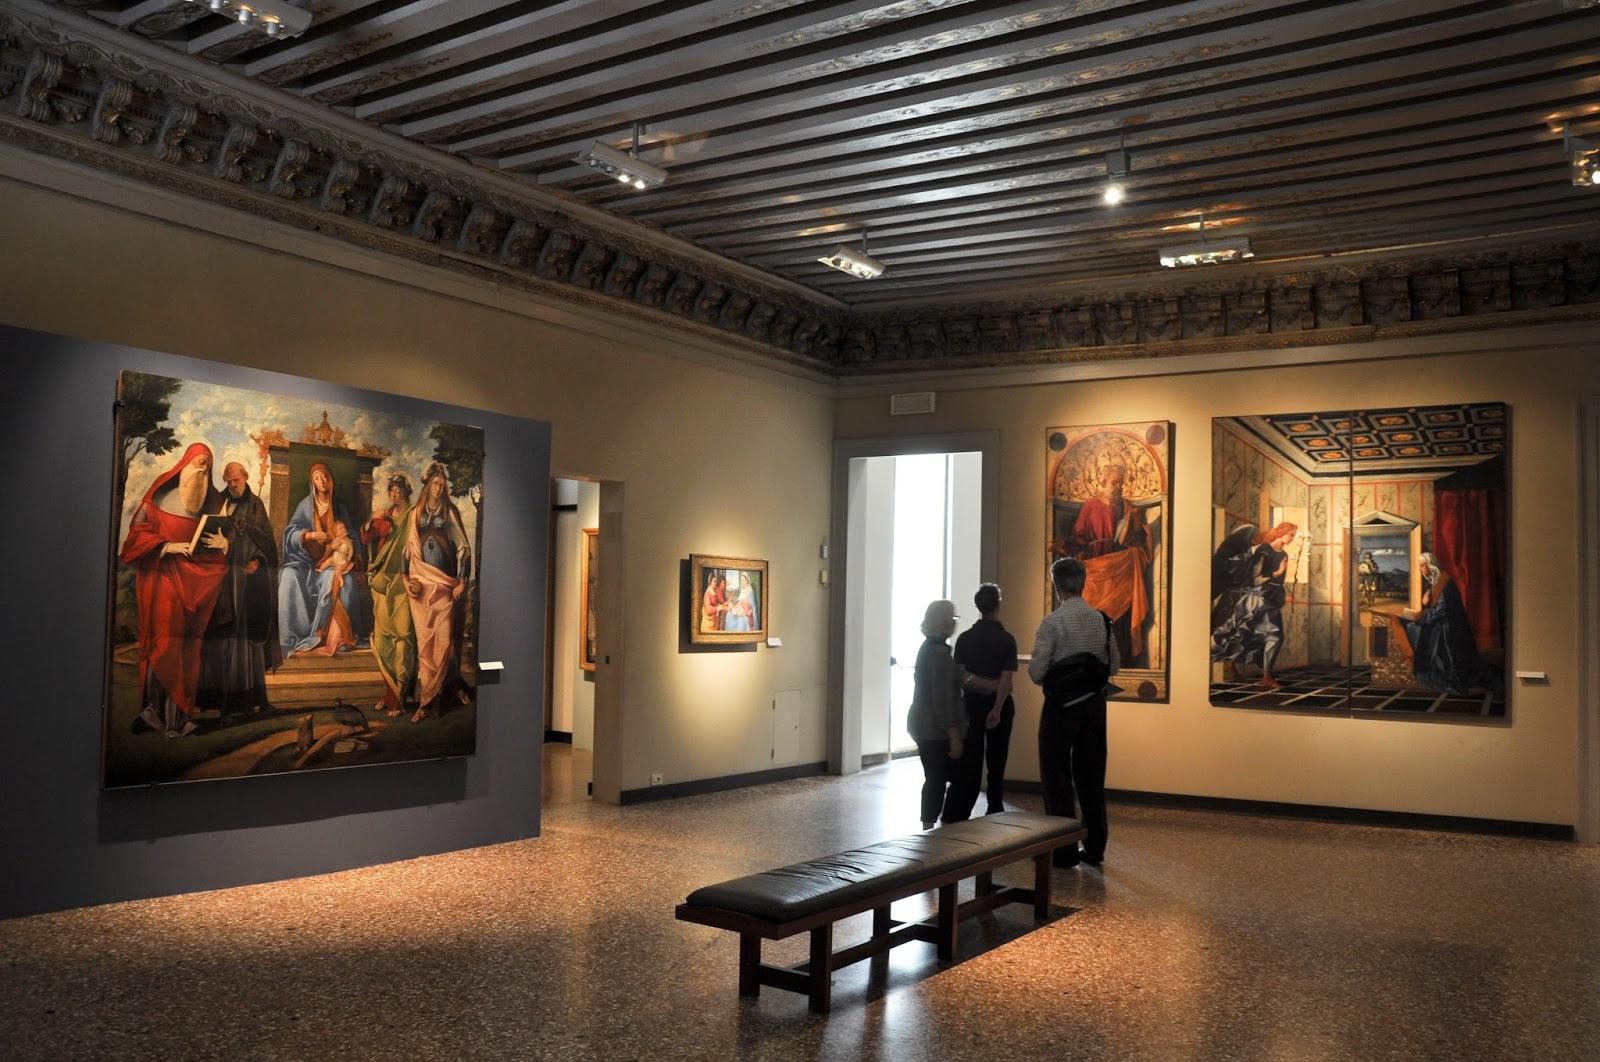 Inside Gallerie dell'Accademia in Venice